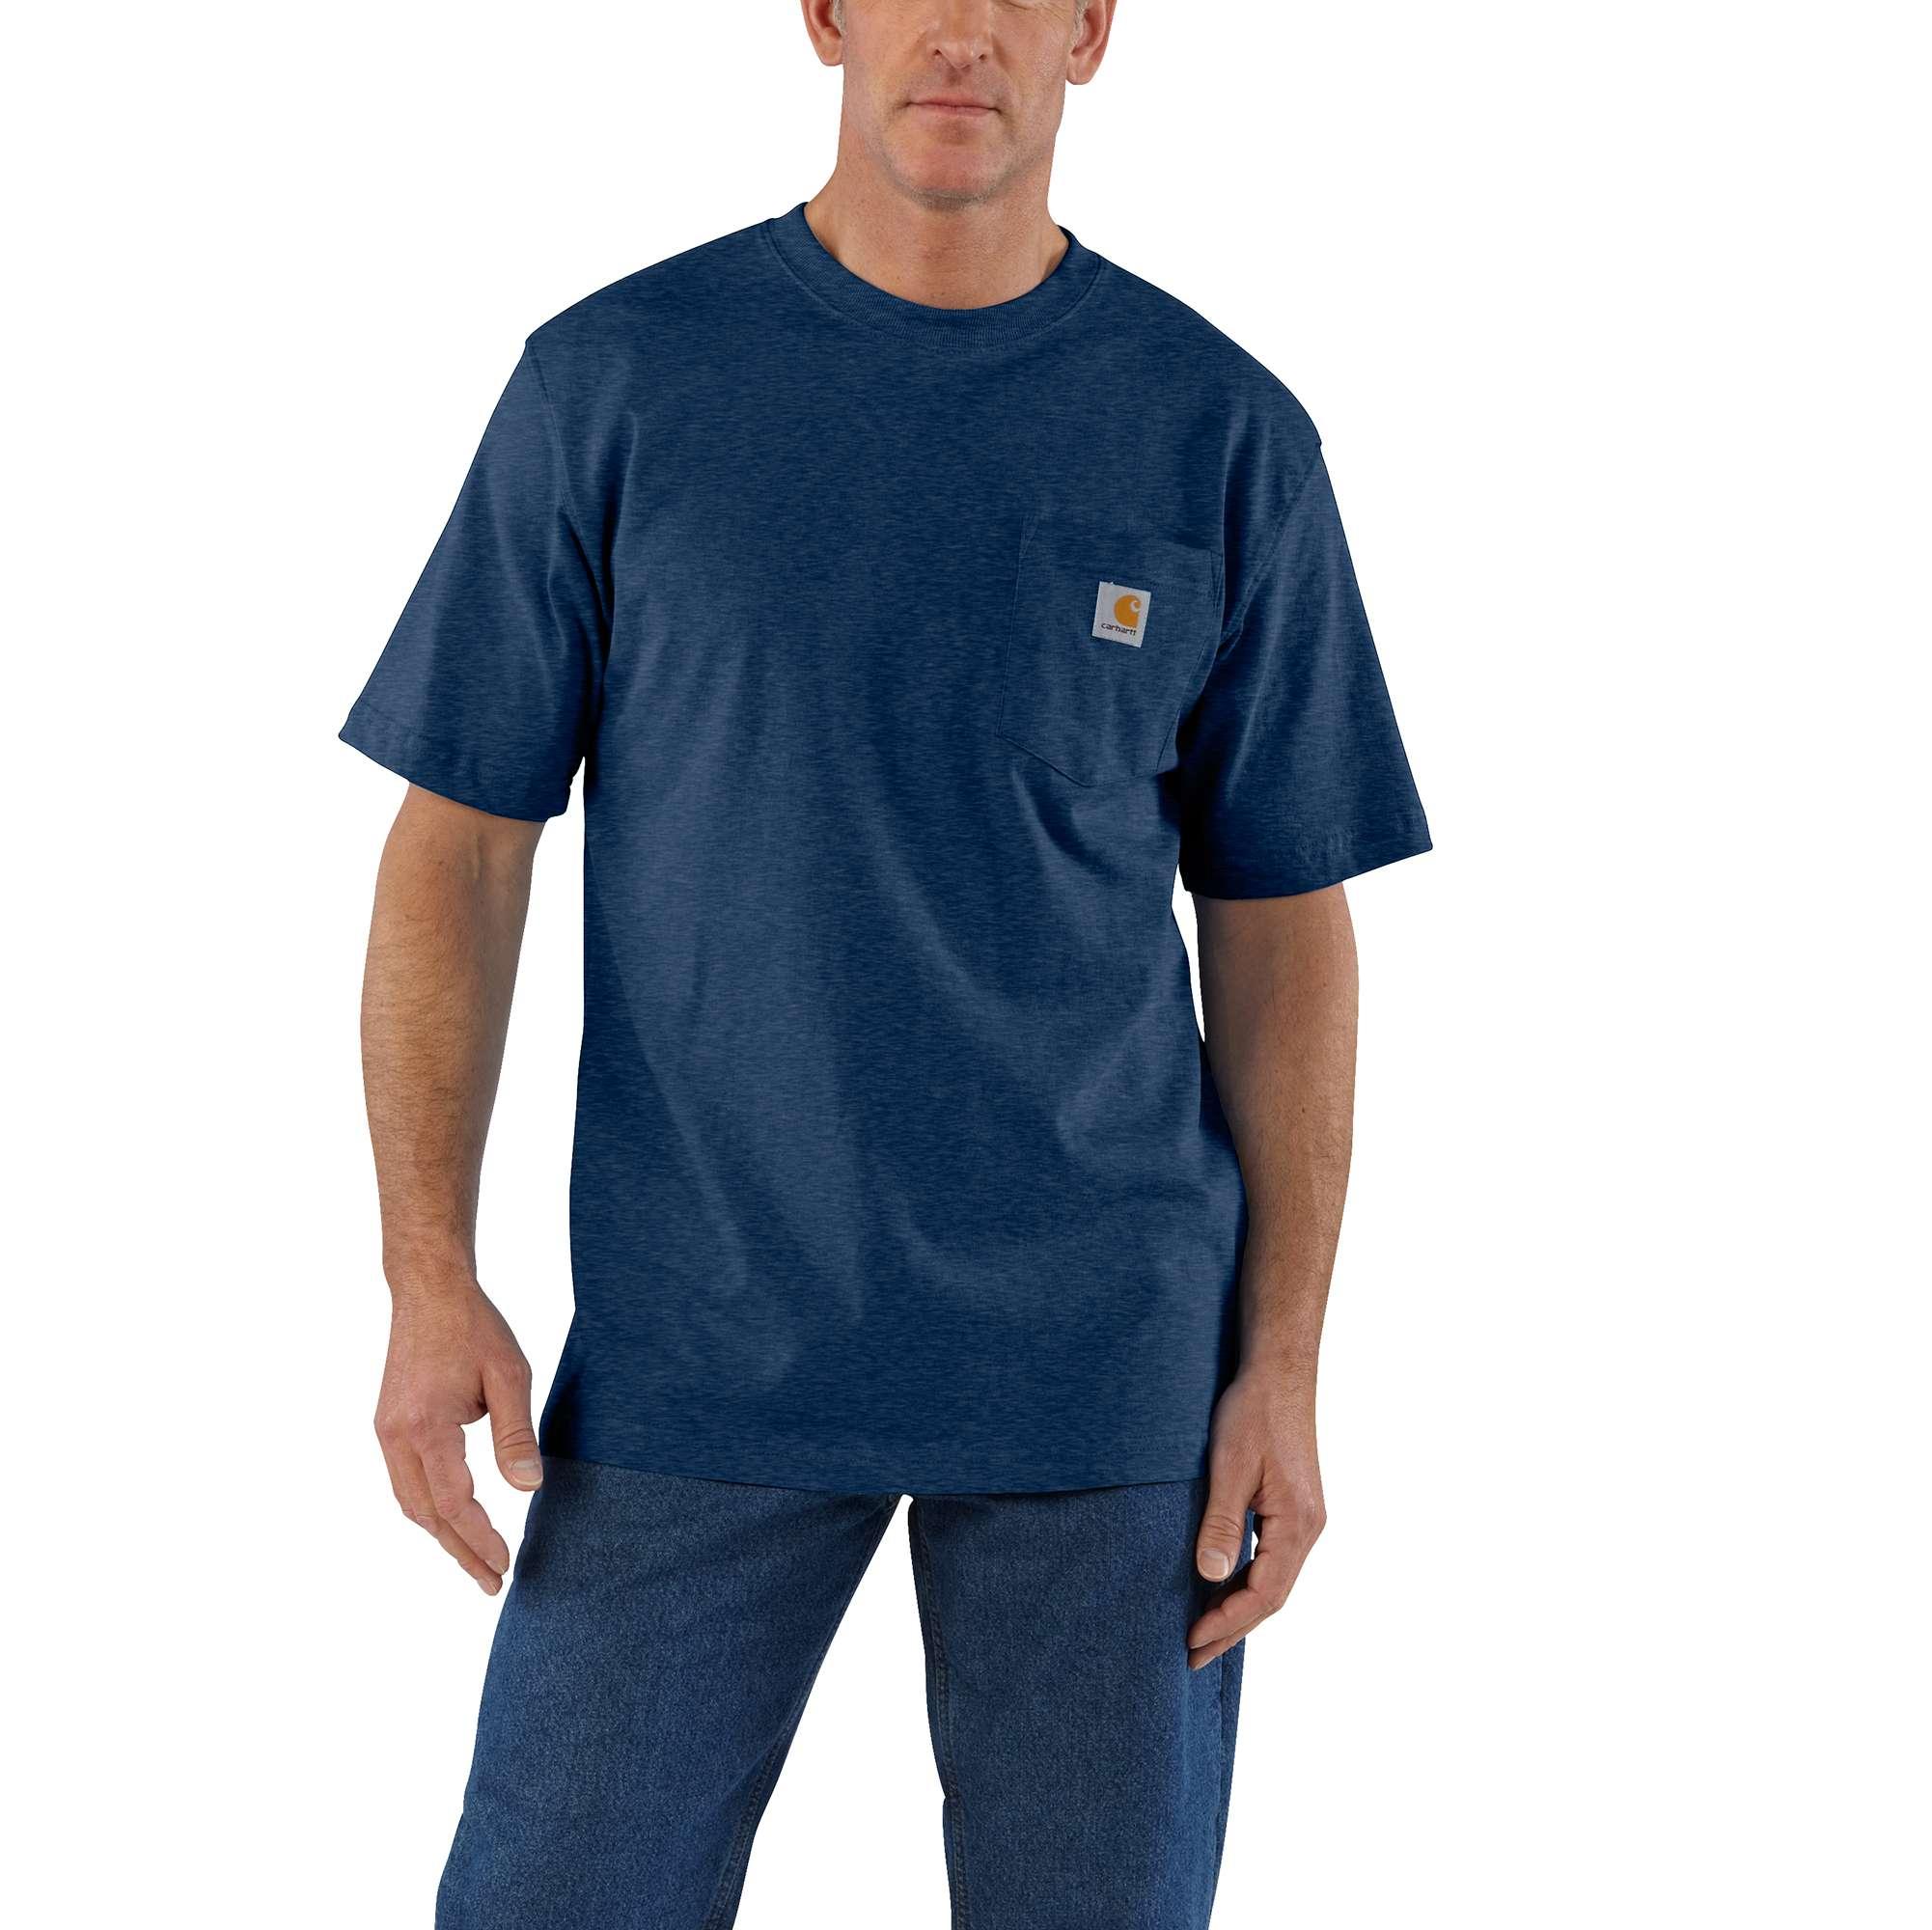 Men's Big & Tall Workwear Pocket T-shirt, Heather Blue, swatch